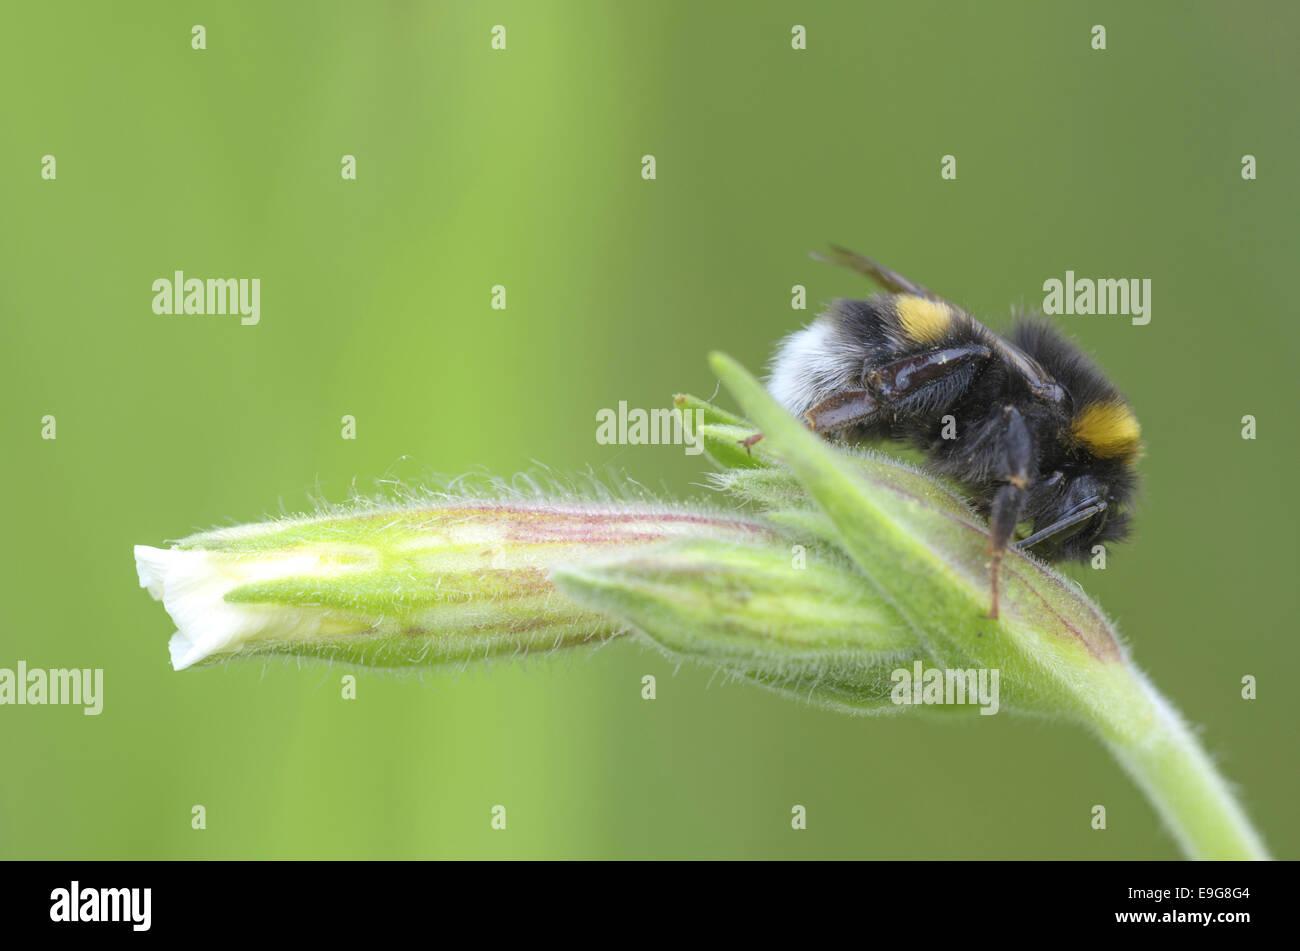 Buff-Tailed Bumblebee (Bombus terrestris) - Stock Image